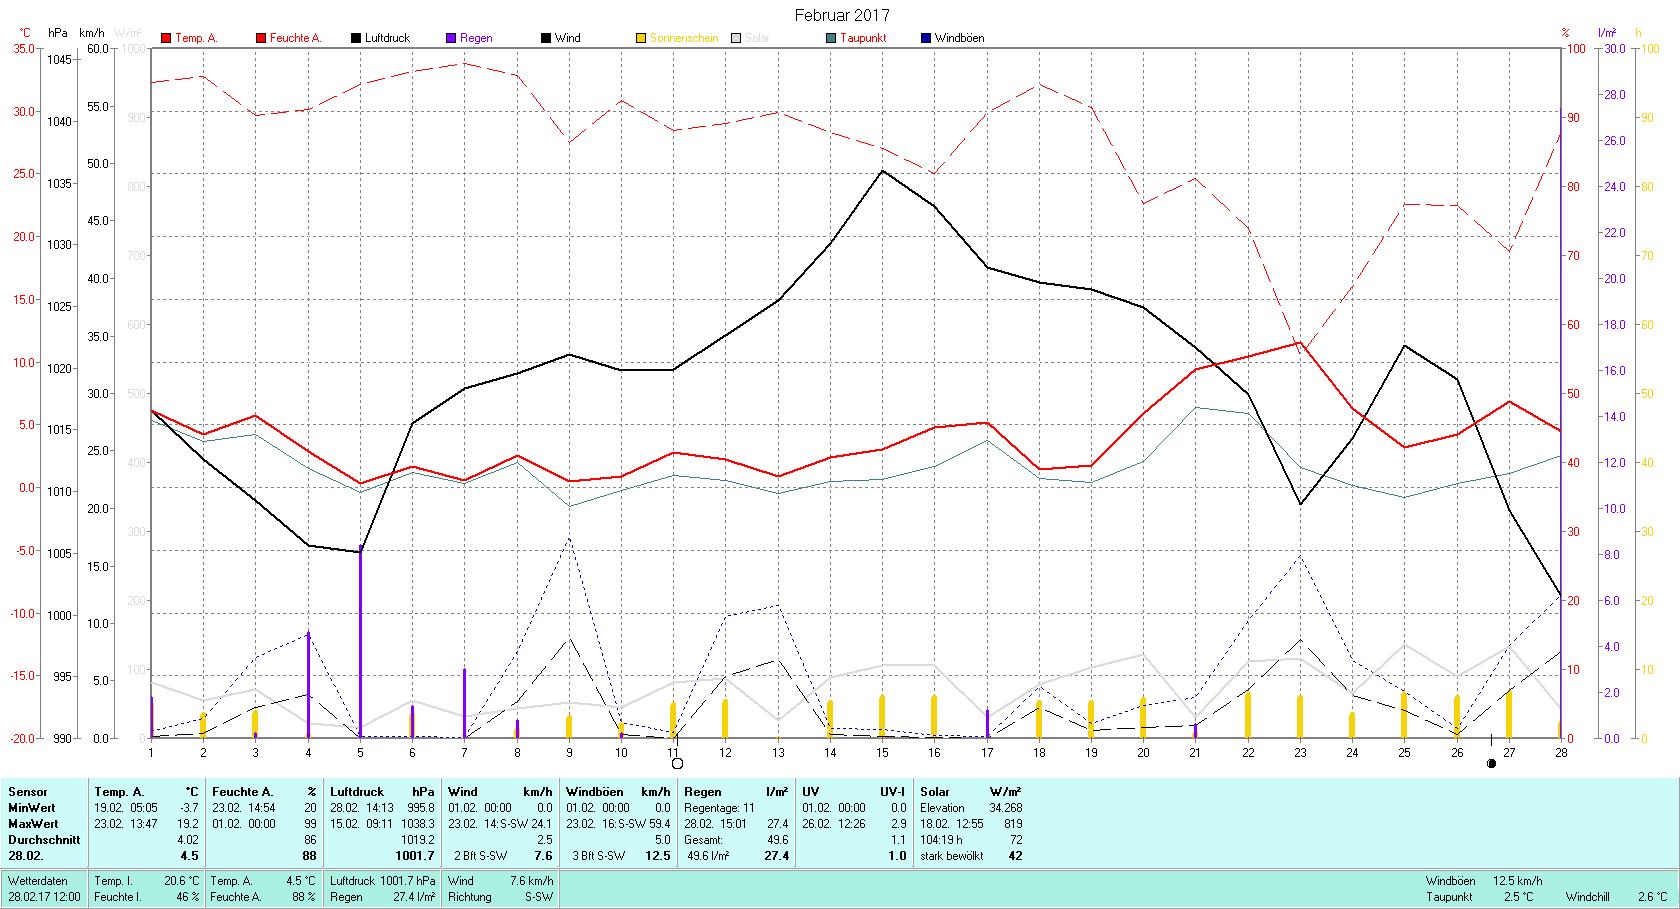 Februar 2017 Tmin -3.7°C, Tmax 19.2°C, Sonne 104:19h, Niederschlag 49.6mm/2